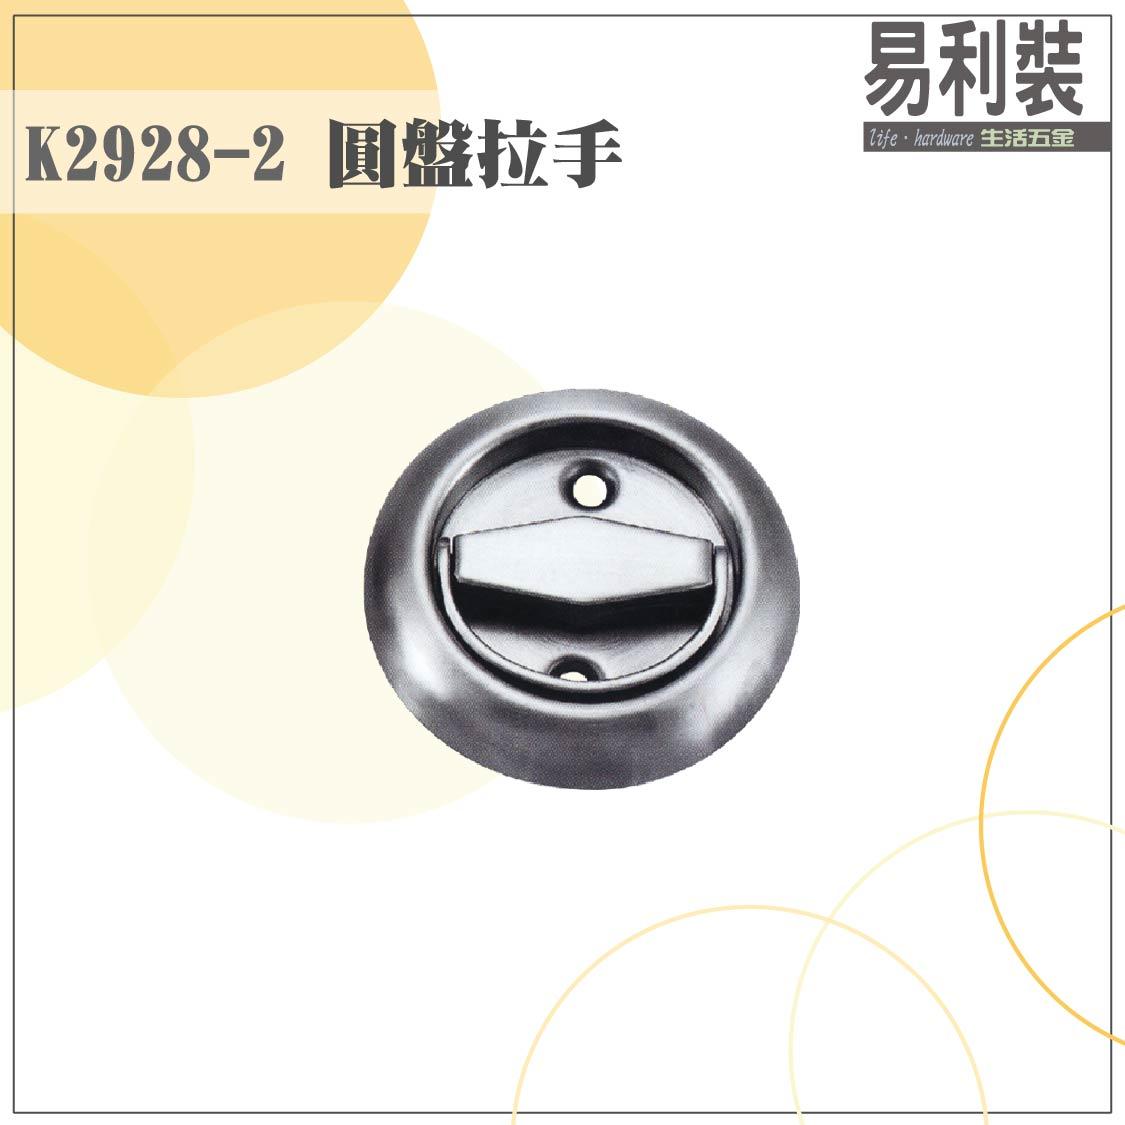 【 EASYCAN  】K2928-2 不鏽鋼圓盤拉手  易利裝生活五金 浴室 廚房 房間 臥房 衣櫃 小資族 辦公家具 系統家具 0